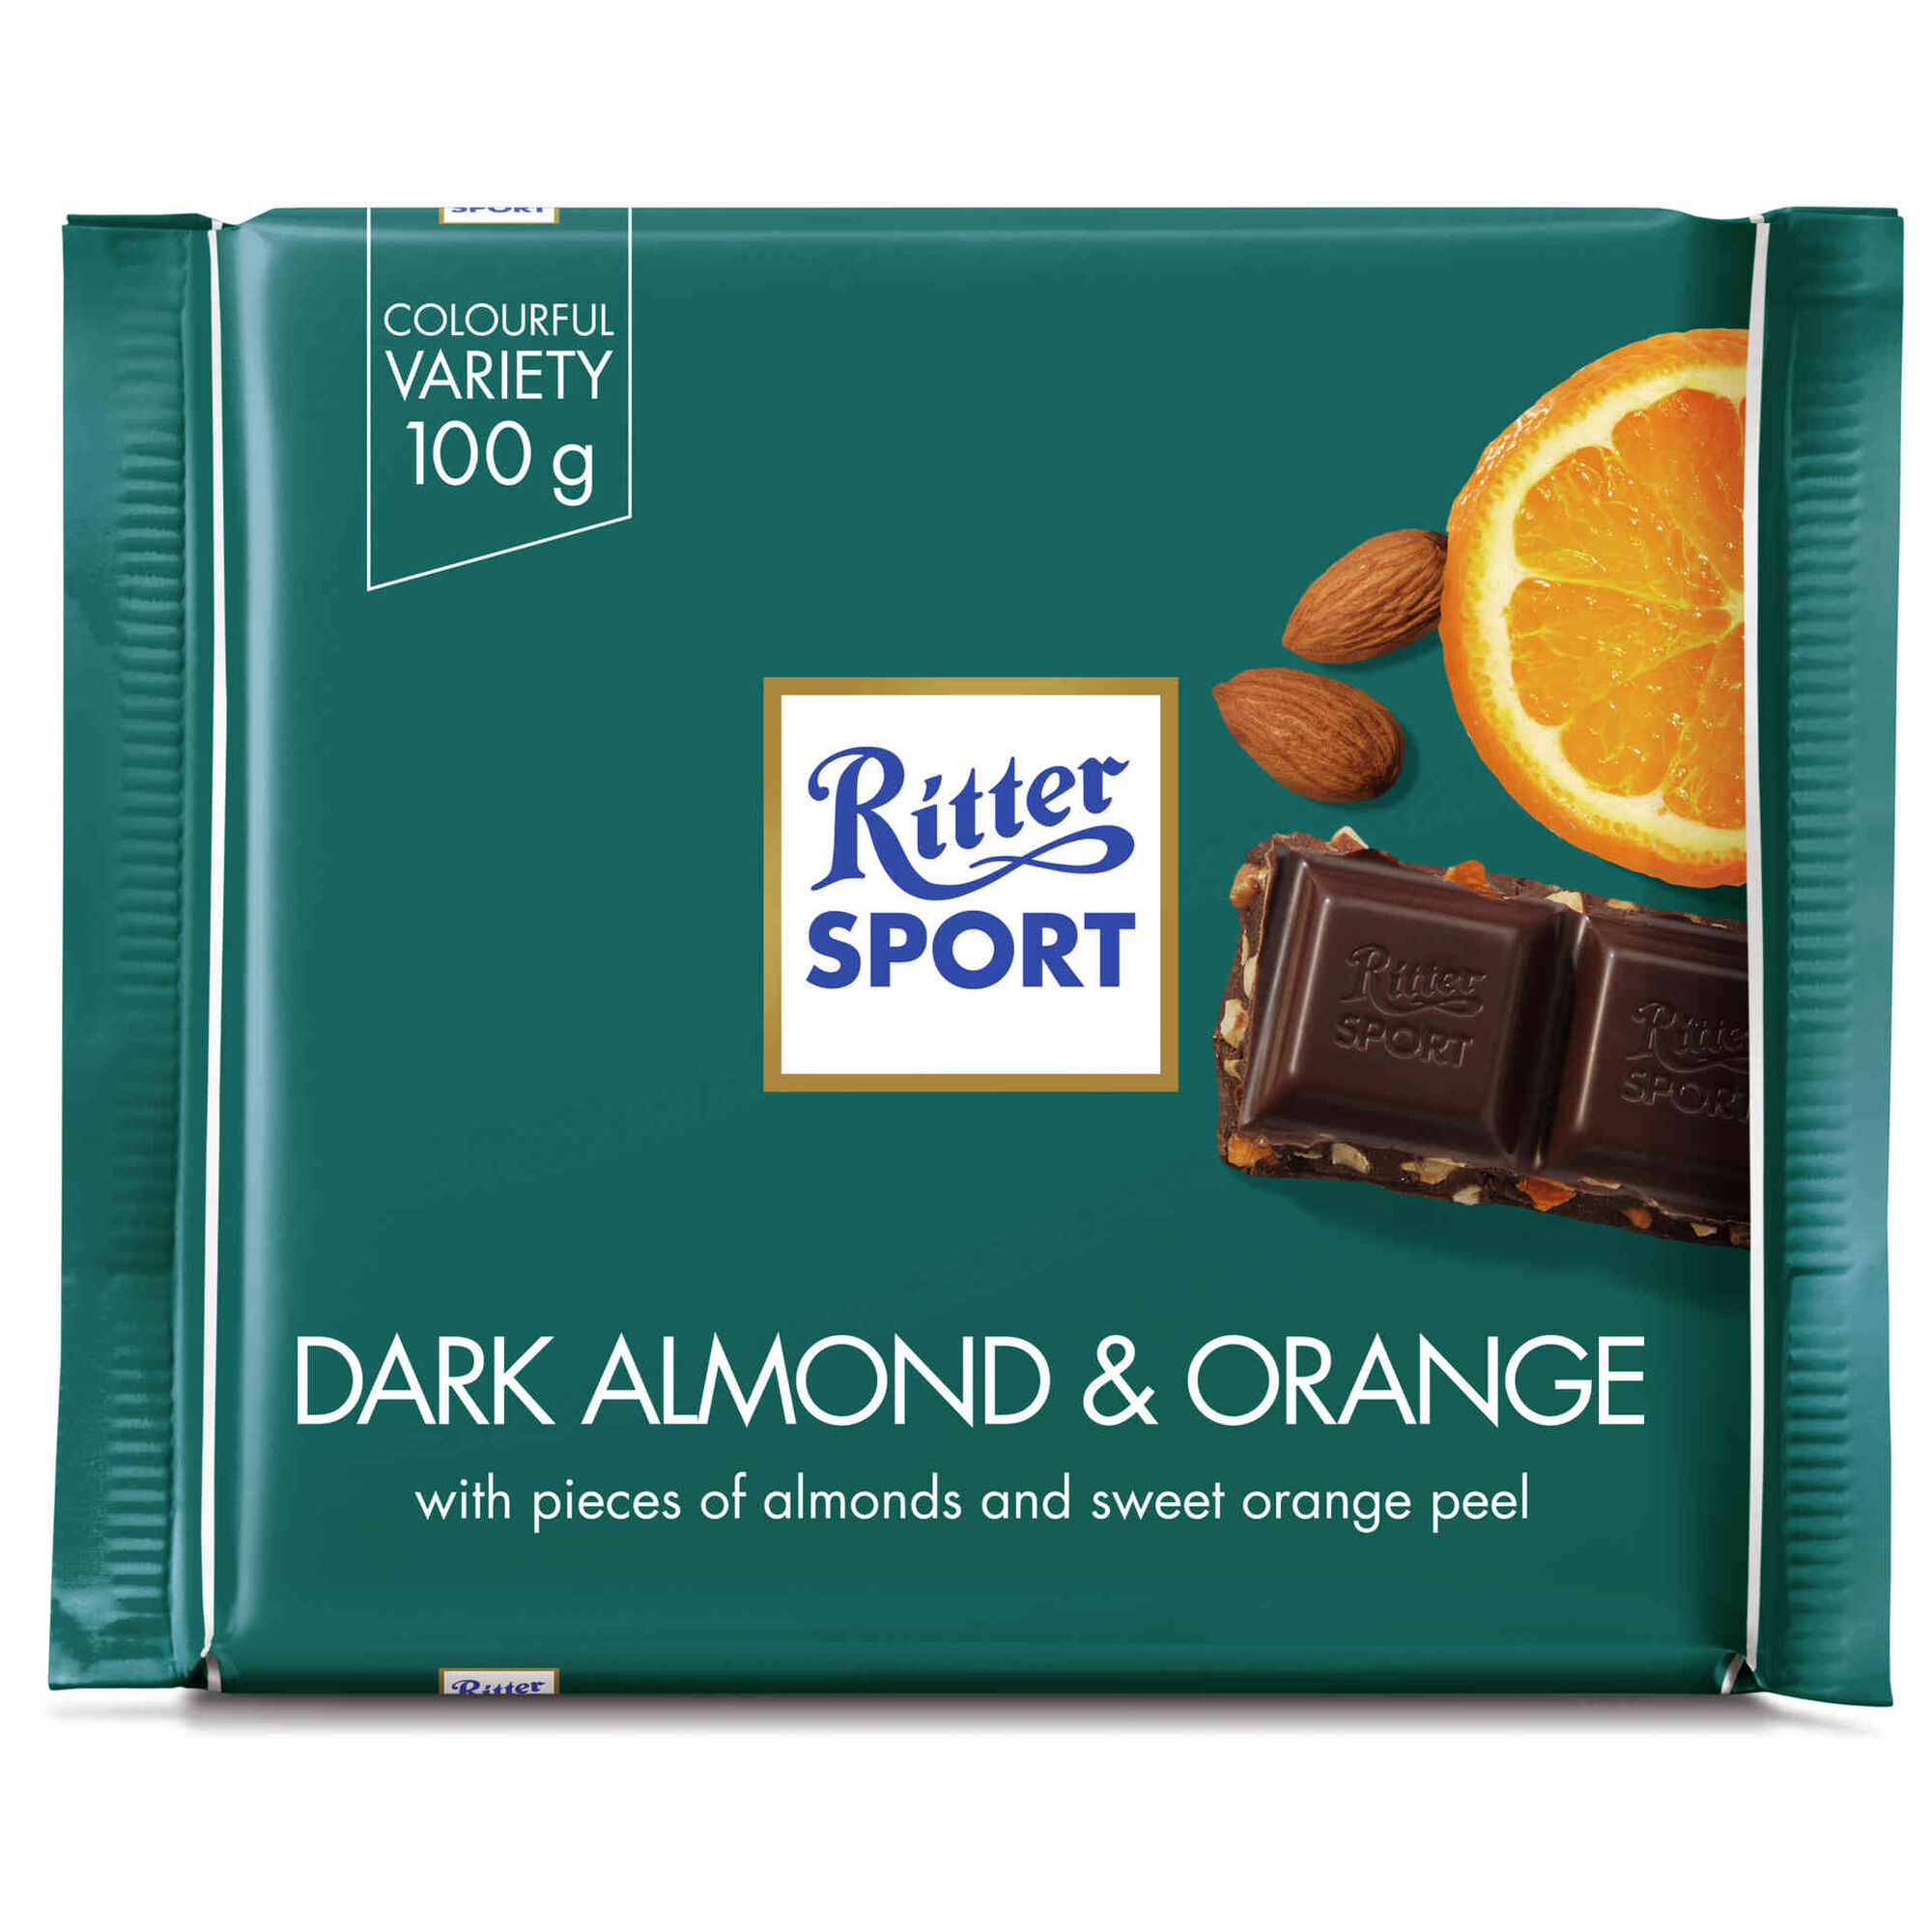 Tablete de Chocolate Negro com Laranja e Amêndoa